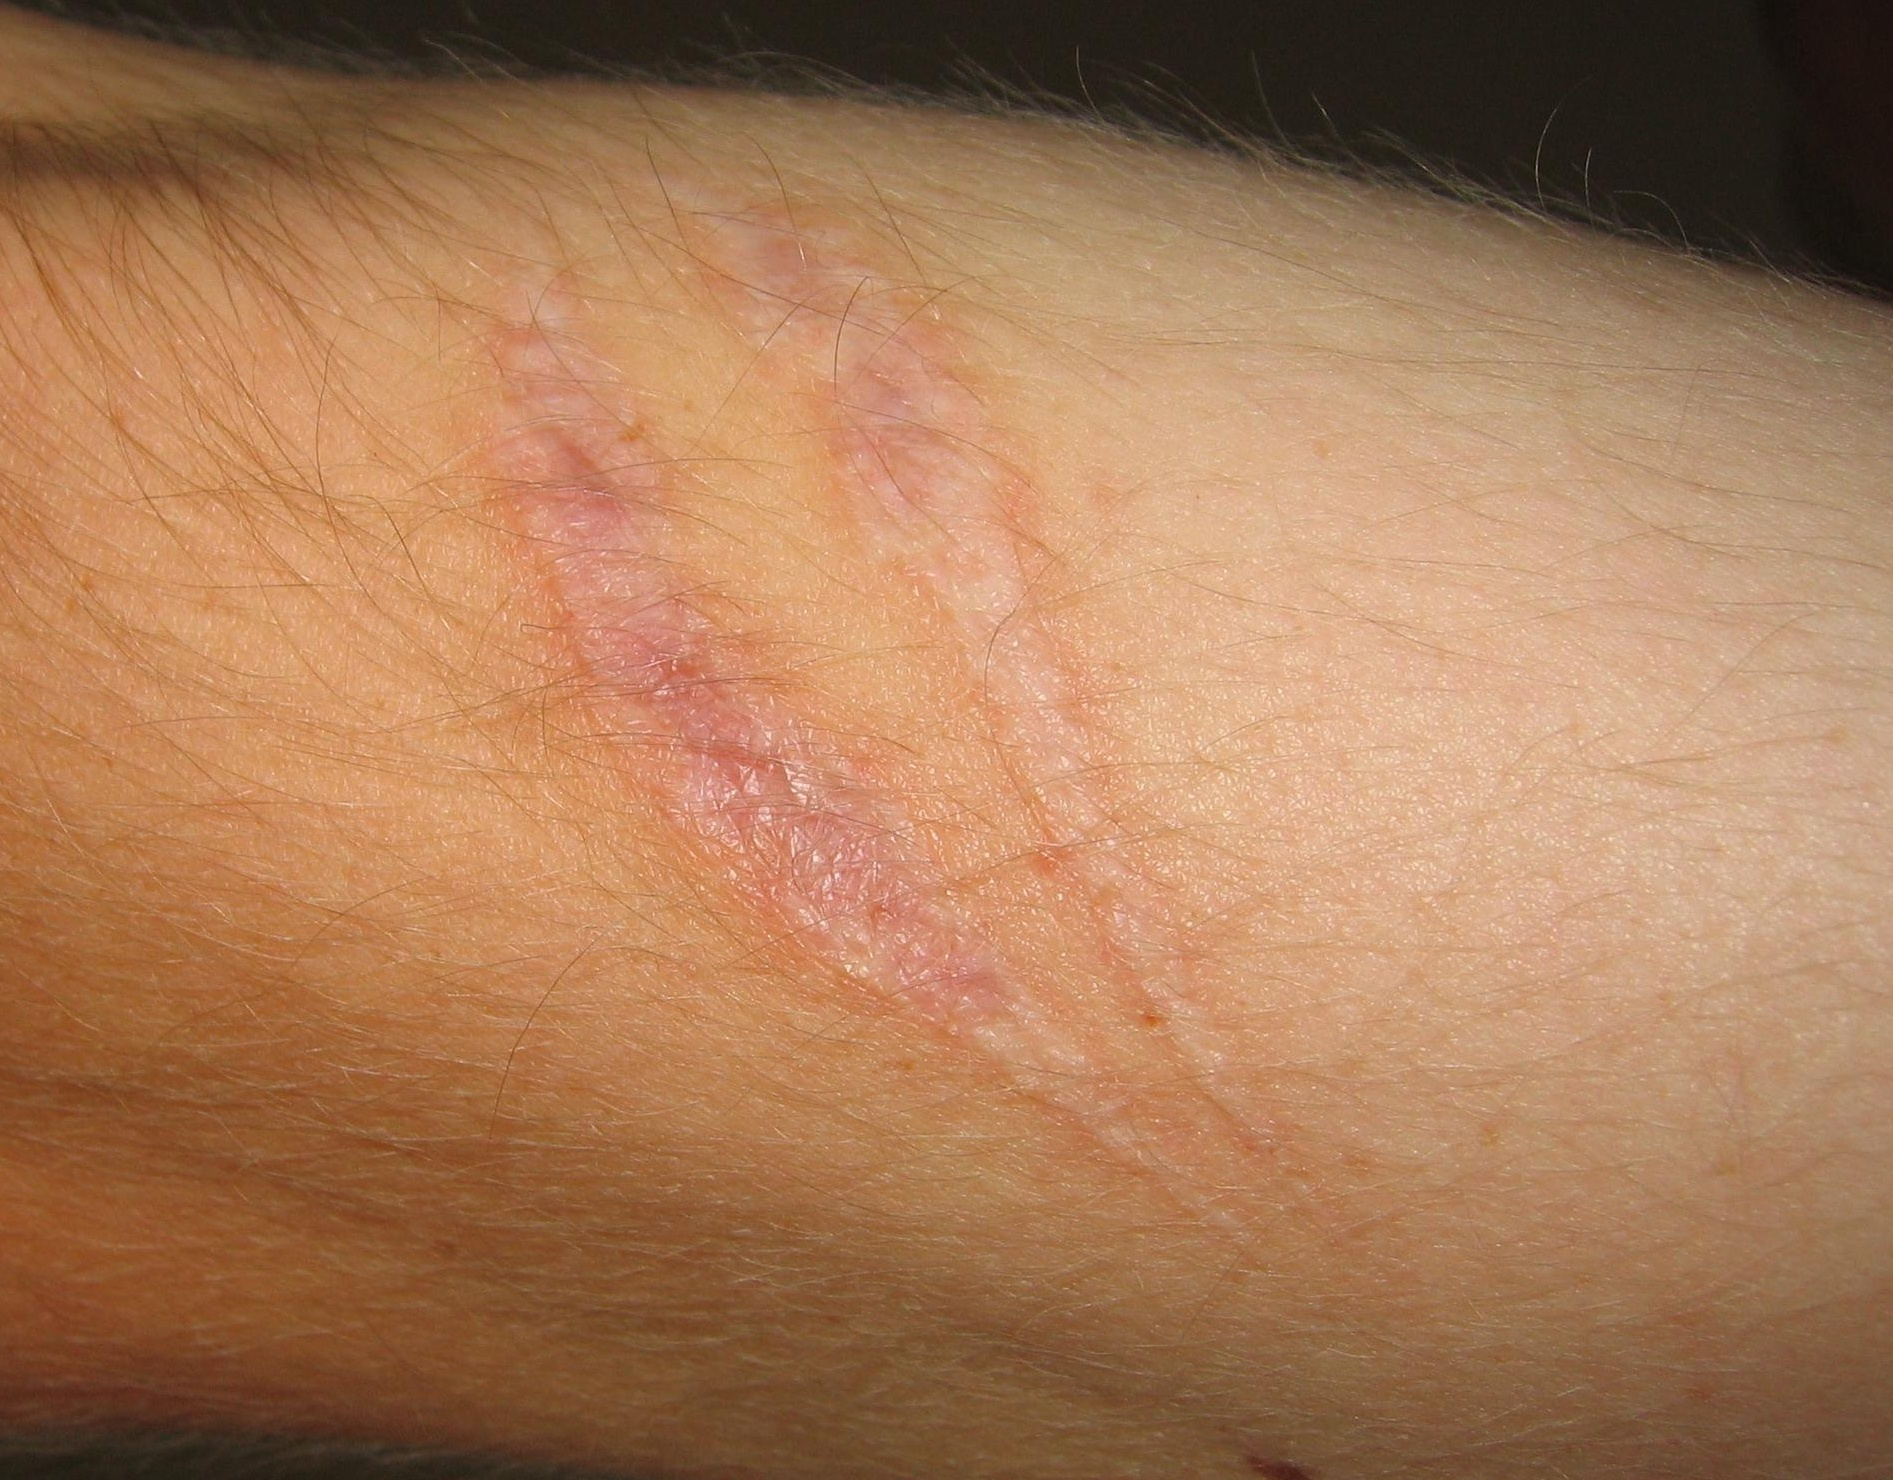 scar on arm